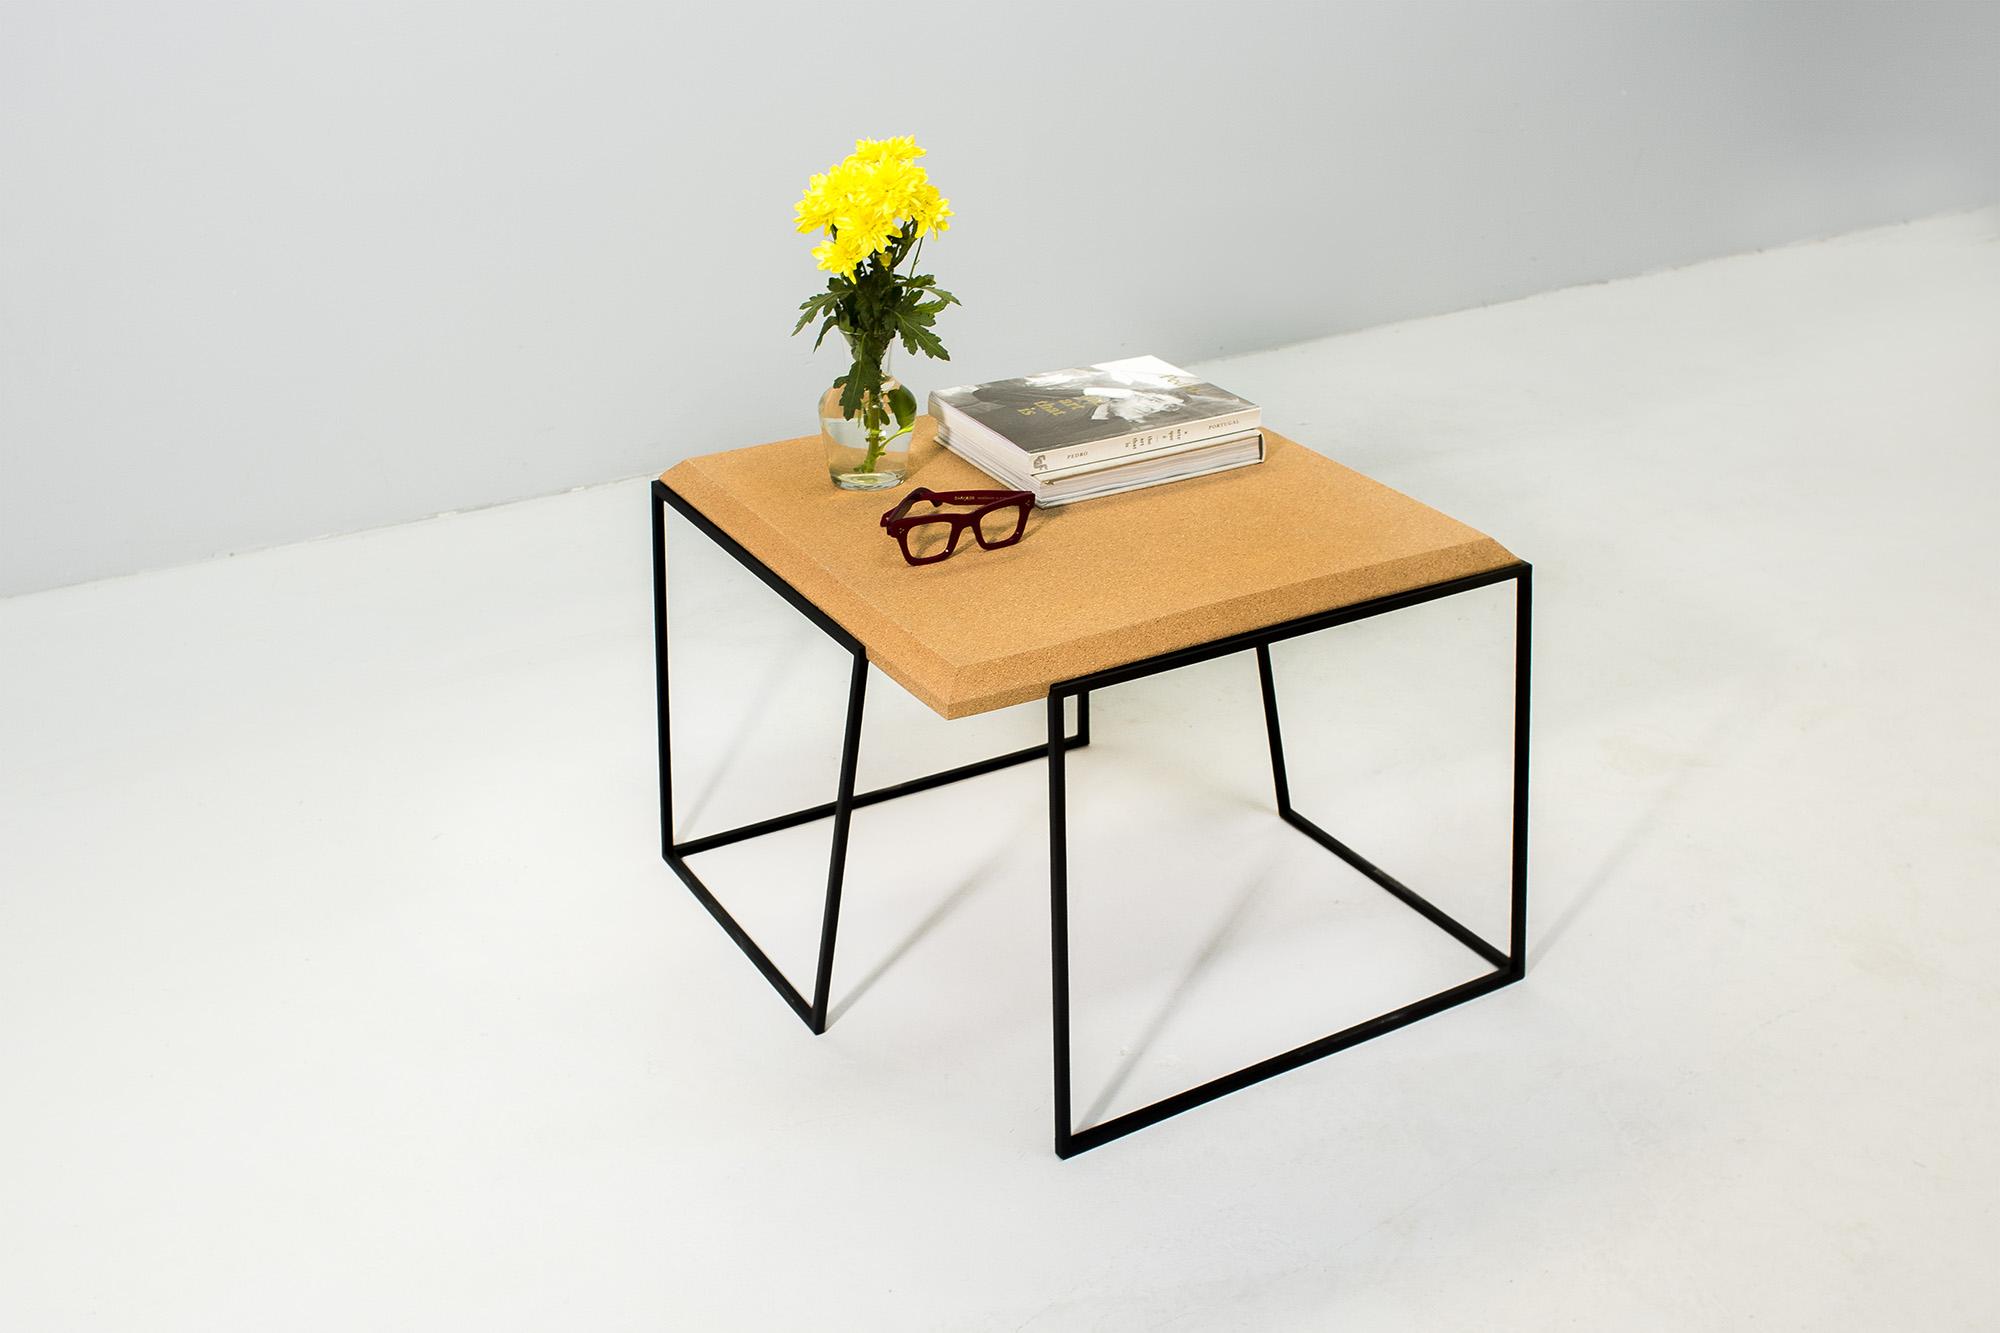 low-Galula-Grão-coffee-table-2-light-cork-black-04.jpg